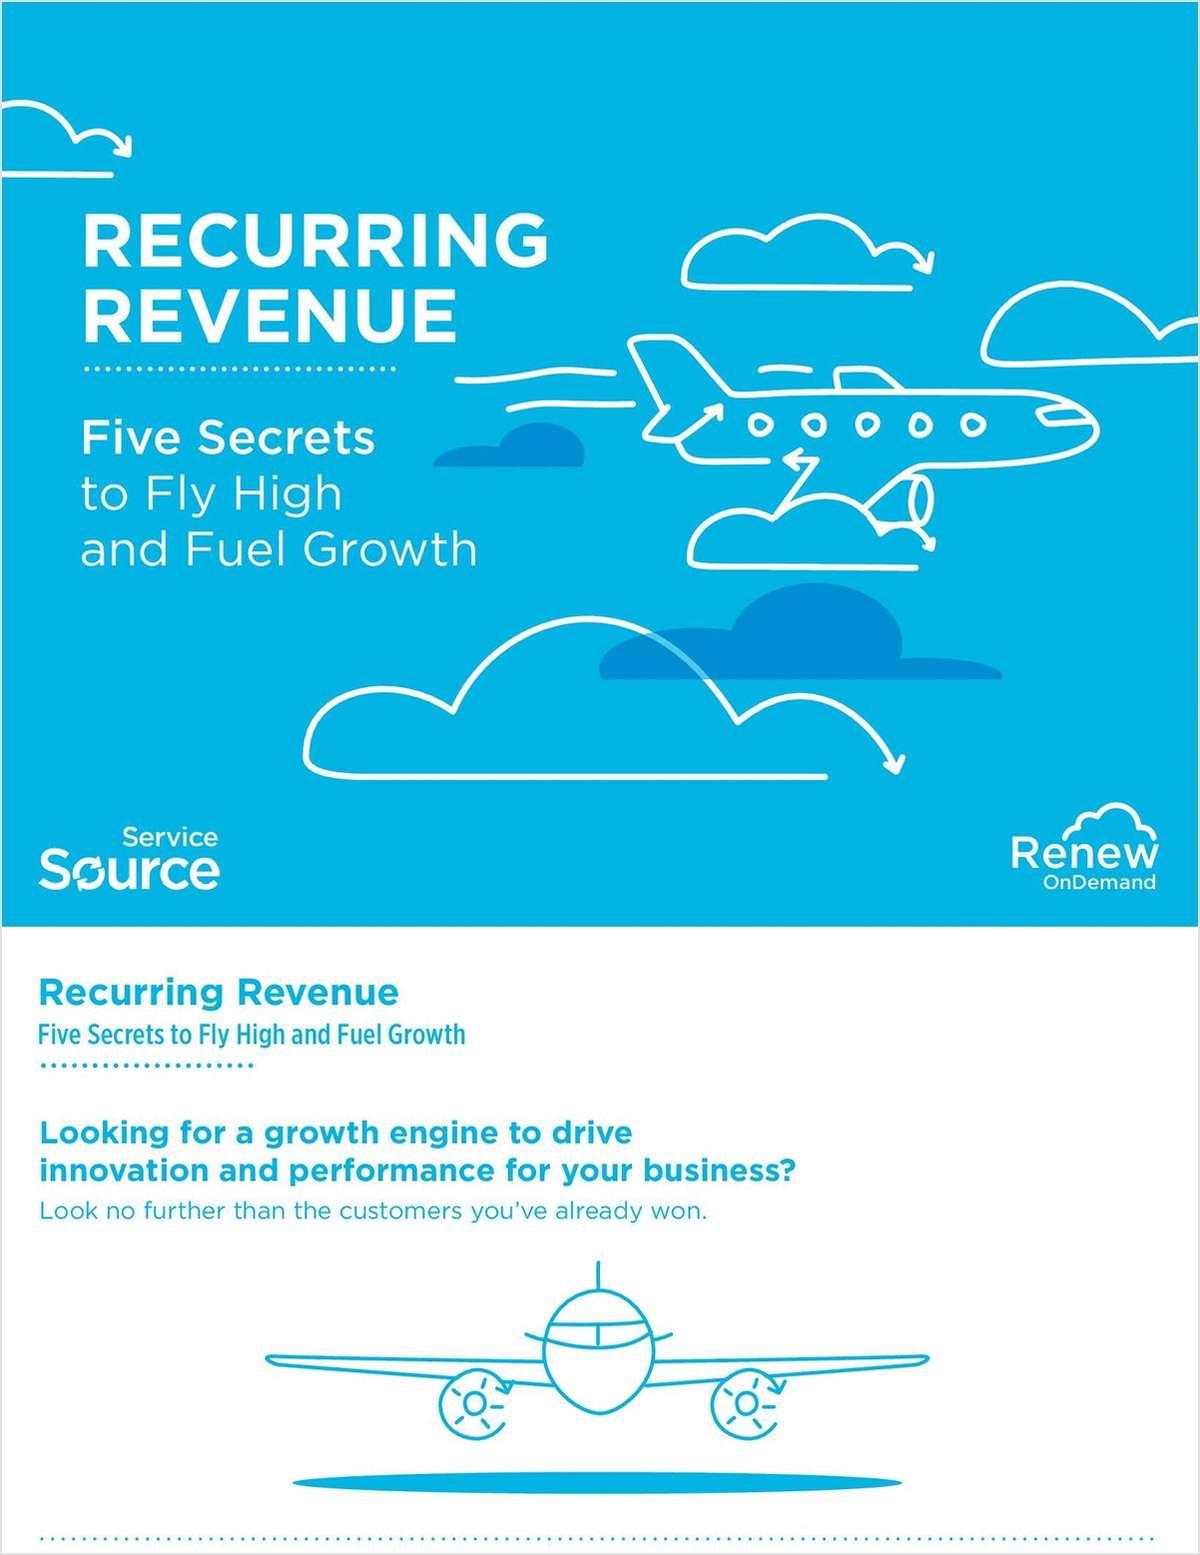 5 Recurring Revenue Growth Secrets